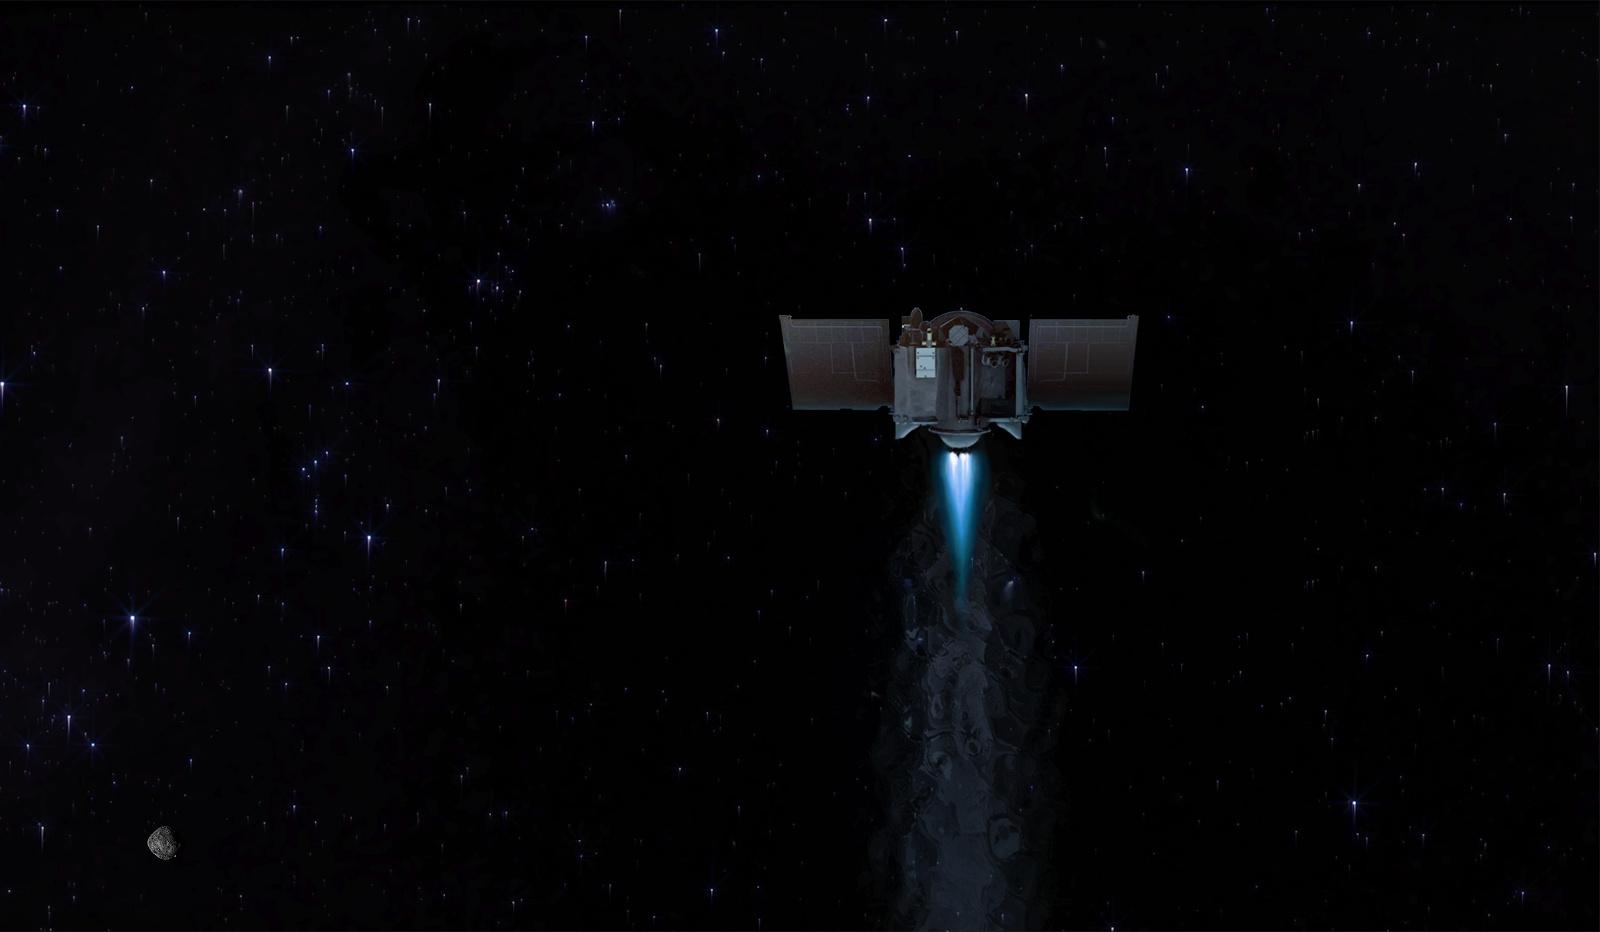 NASA's asteroid-sampling OSIRIS-REx probe will head back to Earth in May - Yahoo Tech